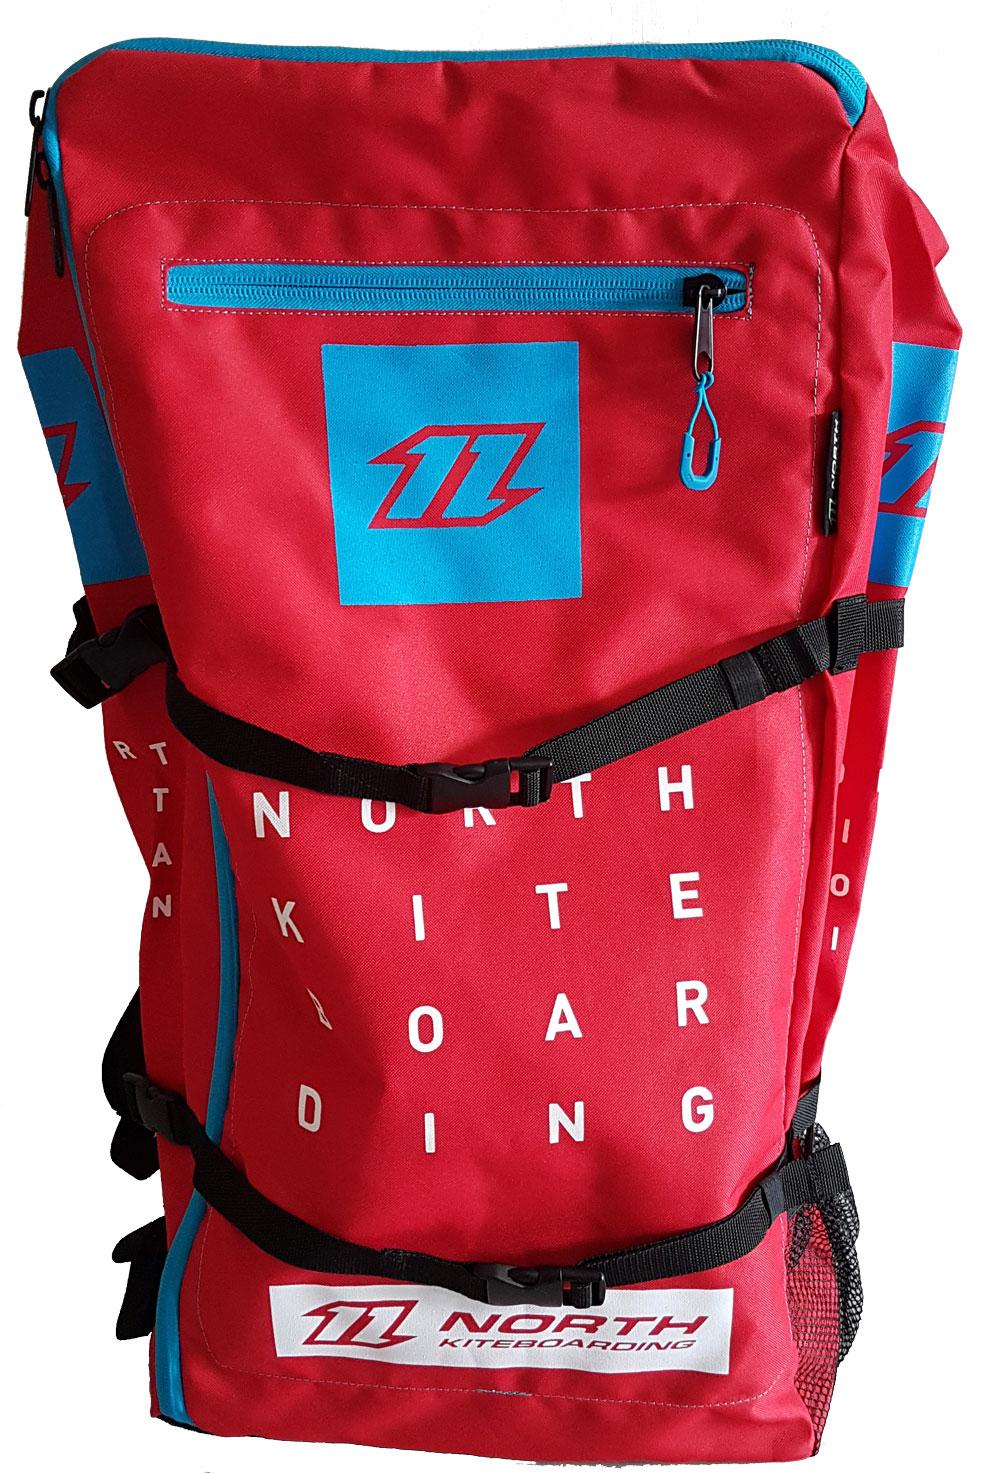 NKB Ersatz Kite Bag Spare - Packsack für North Kites - Kitebag - Kiterucksack